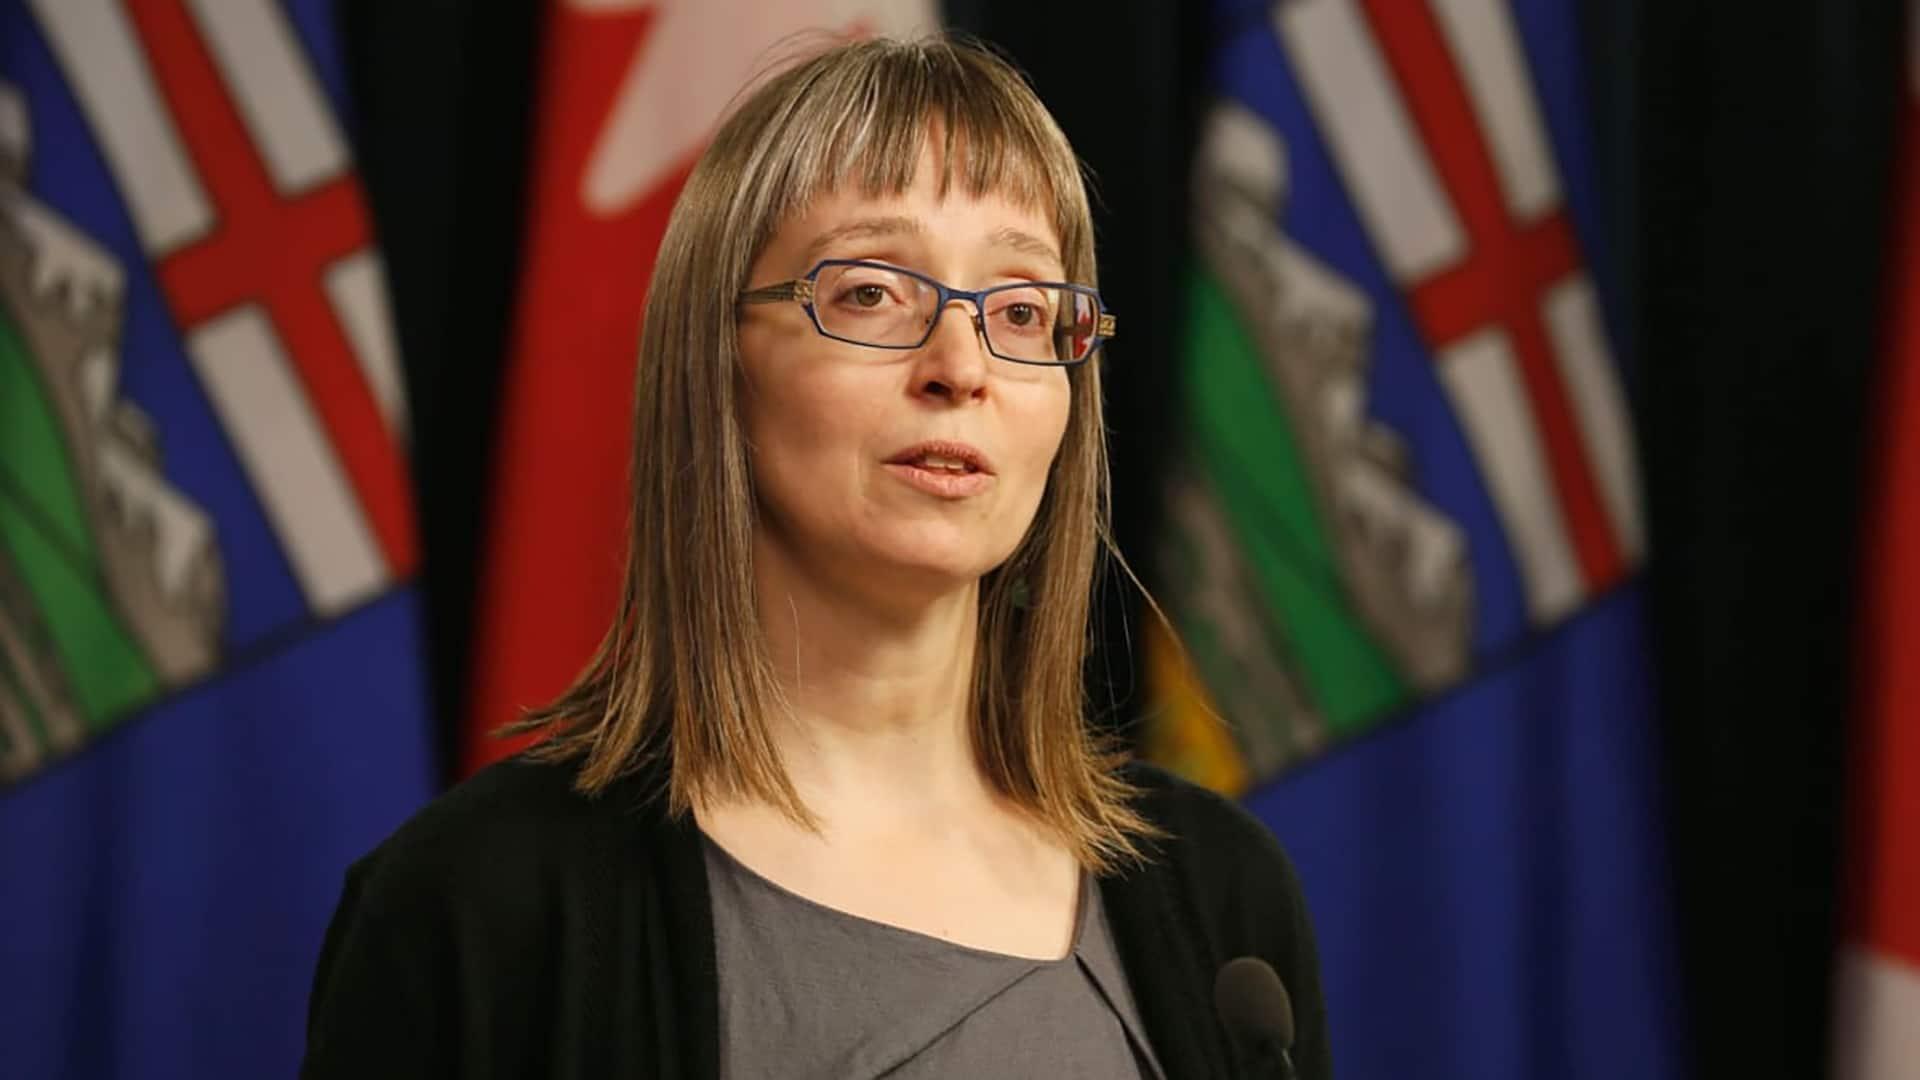 Alberta records 1,227 new COVID-19 cases, nine deaths